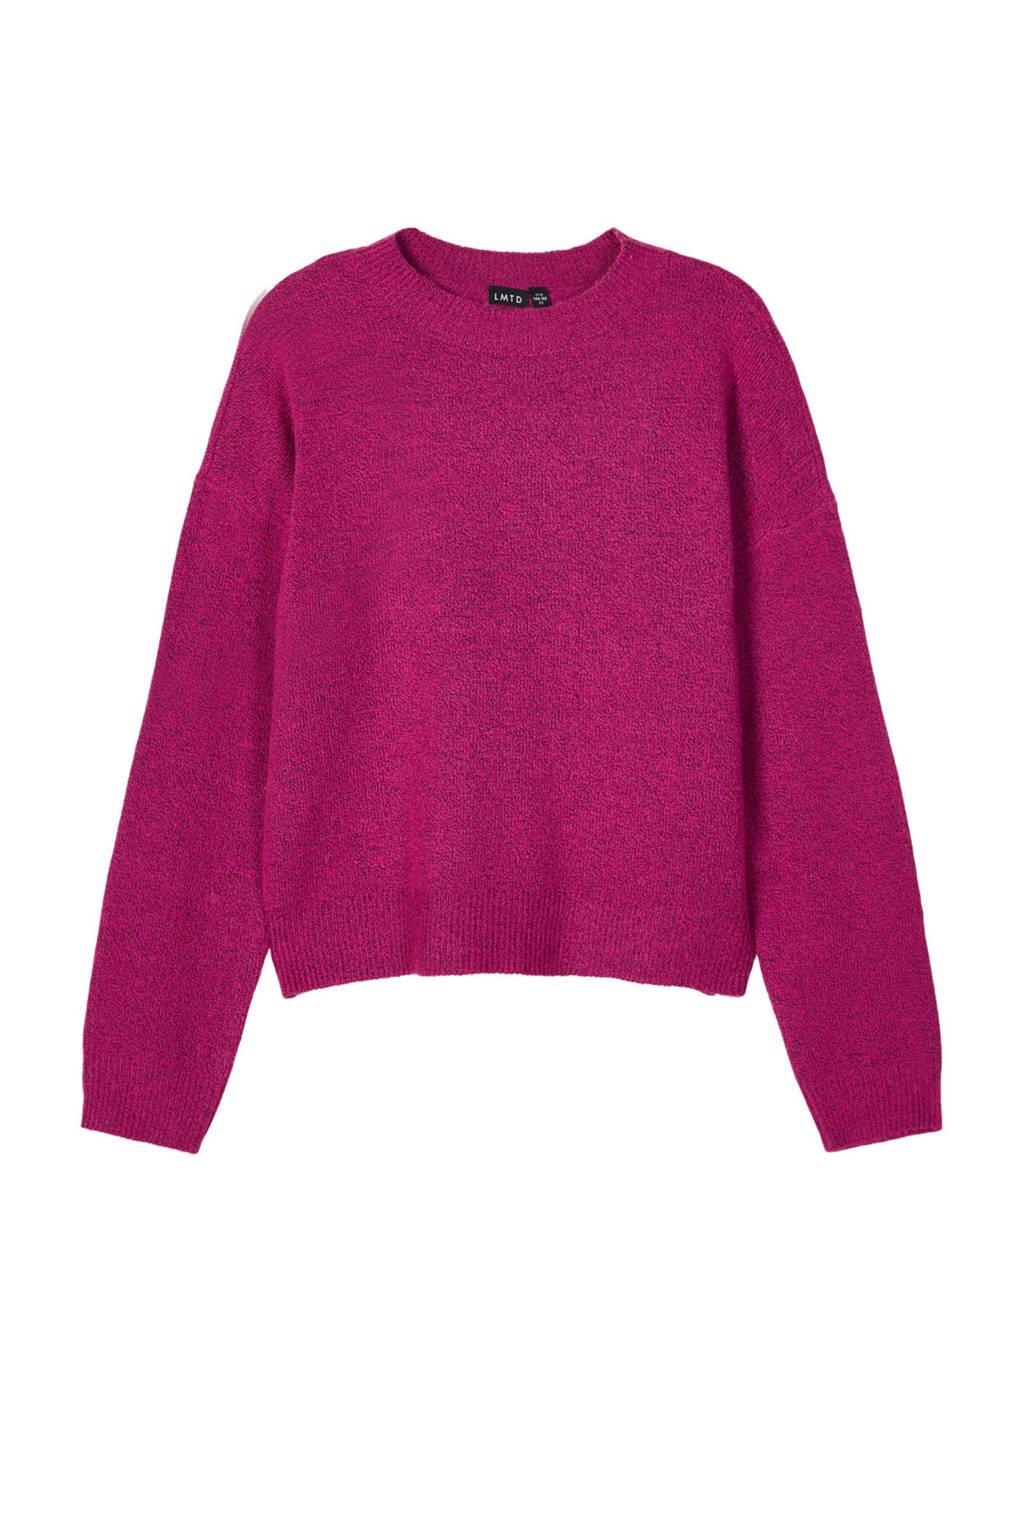 LMTD trui Nonette van gerecycled polyester roze, Roze